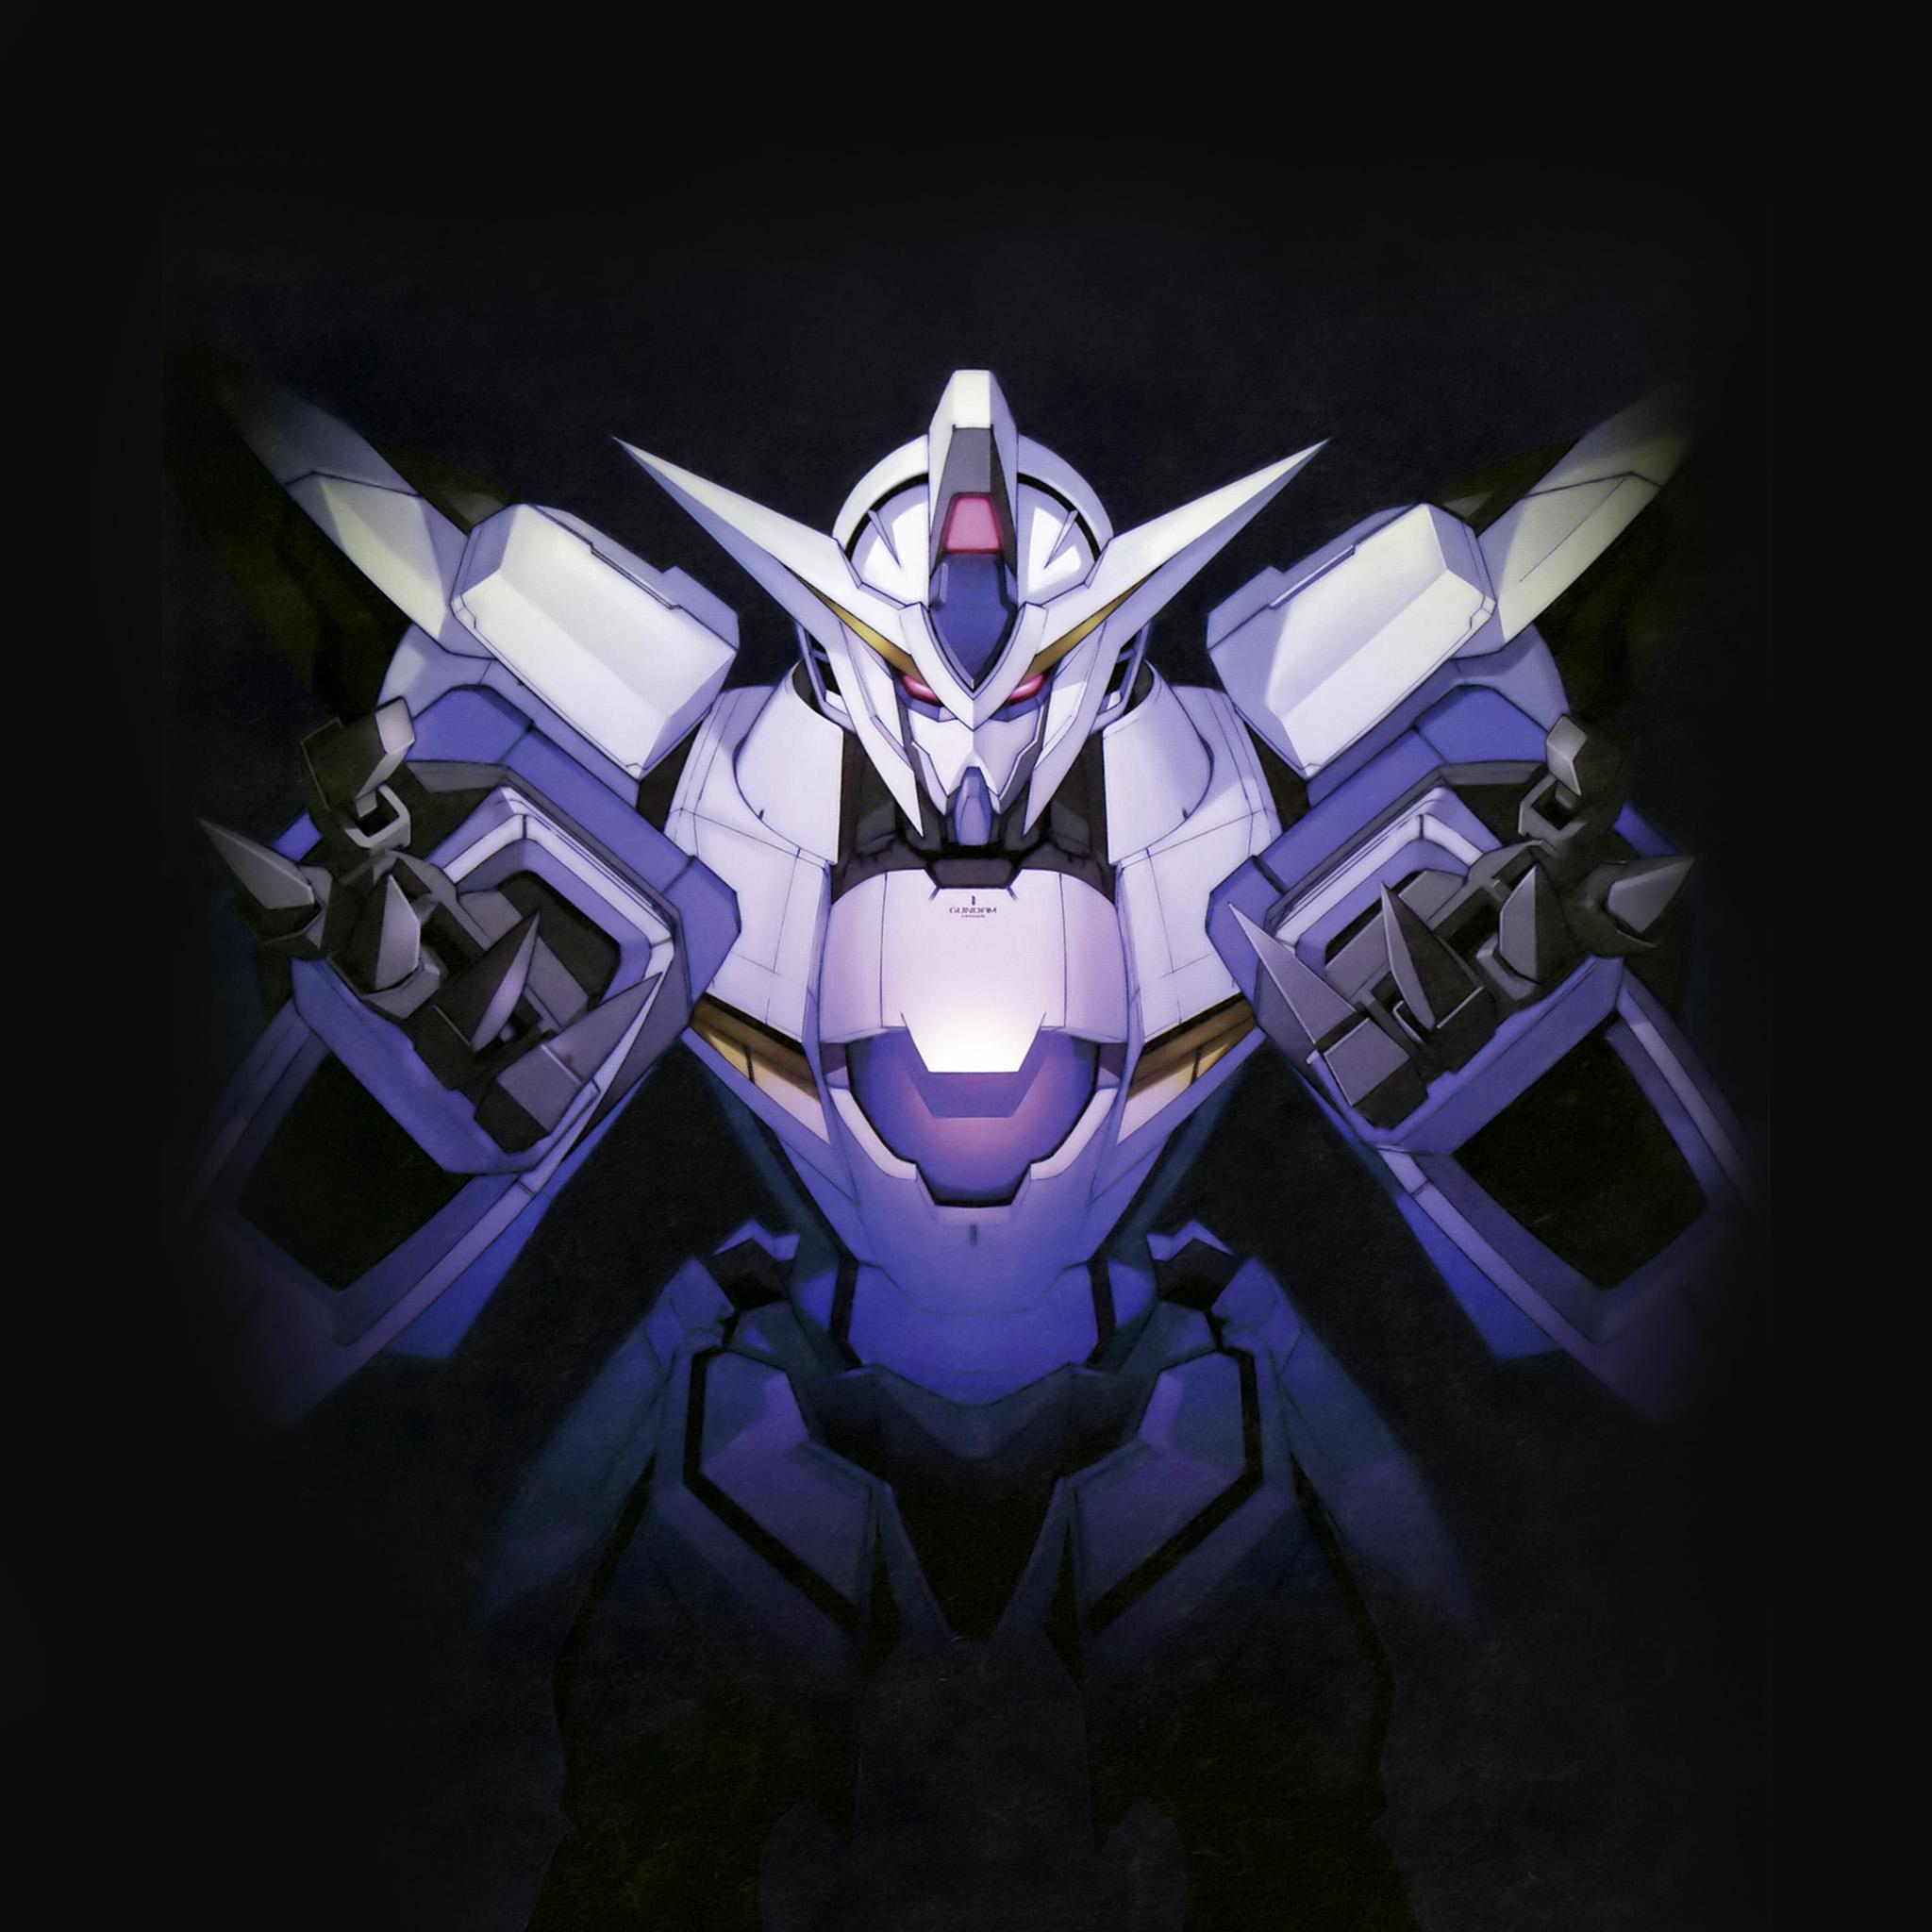 Gundam Iphone Wallpaper: Am63-gundam-art-dark-toy-game-illust-art